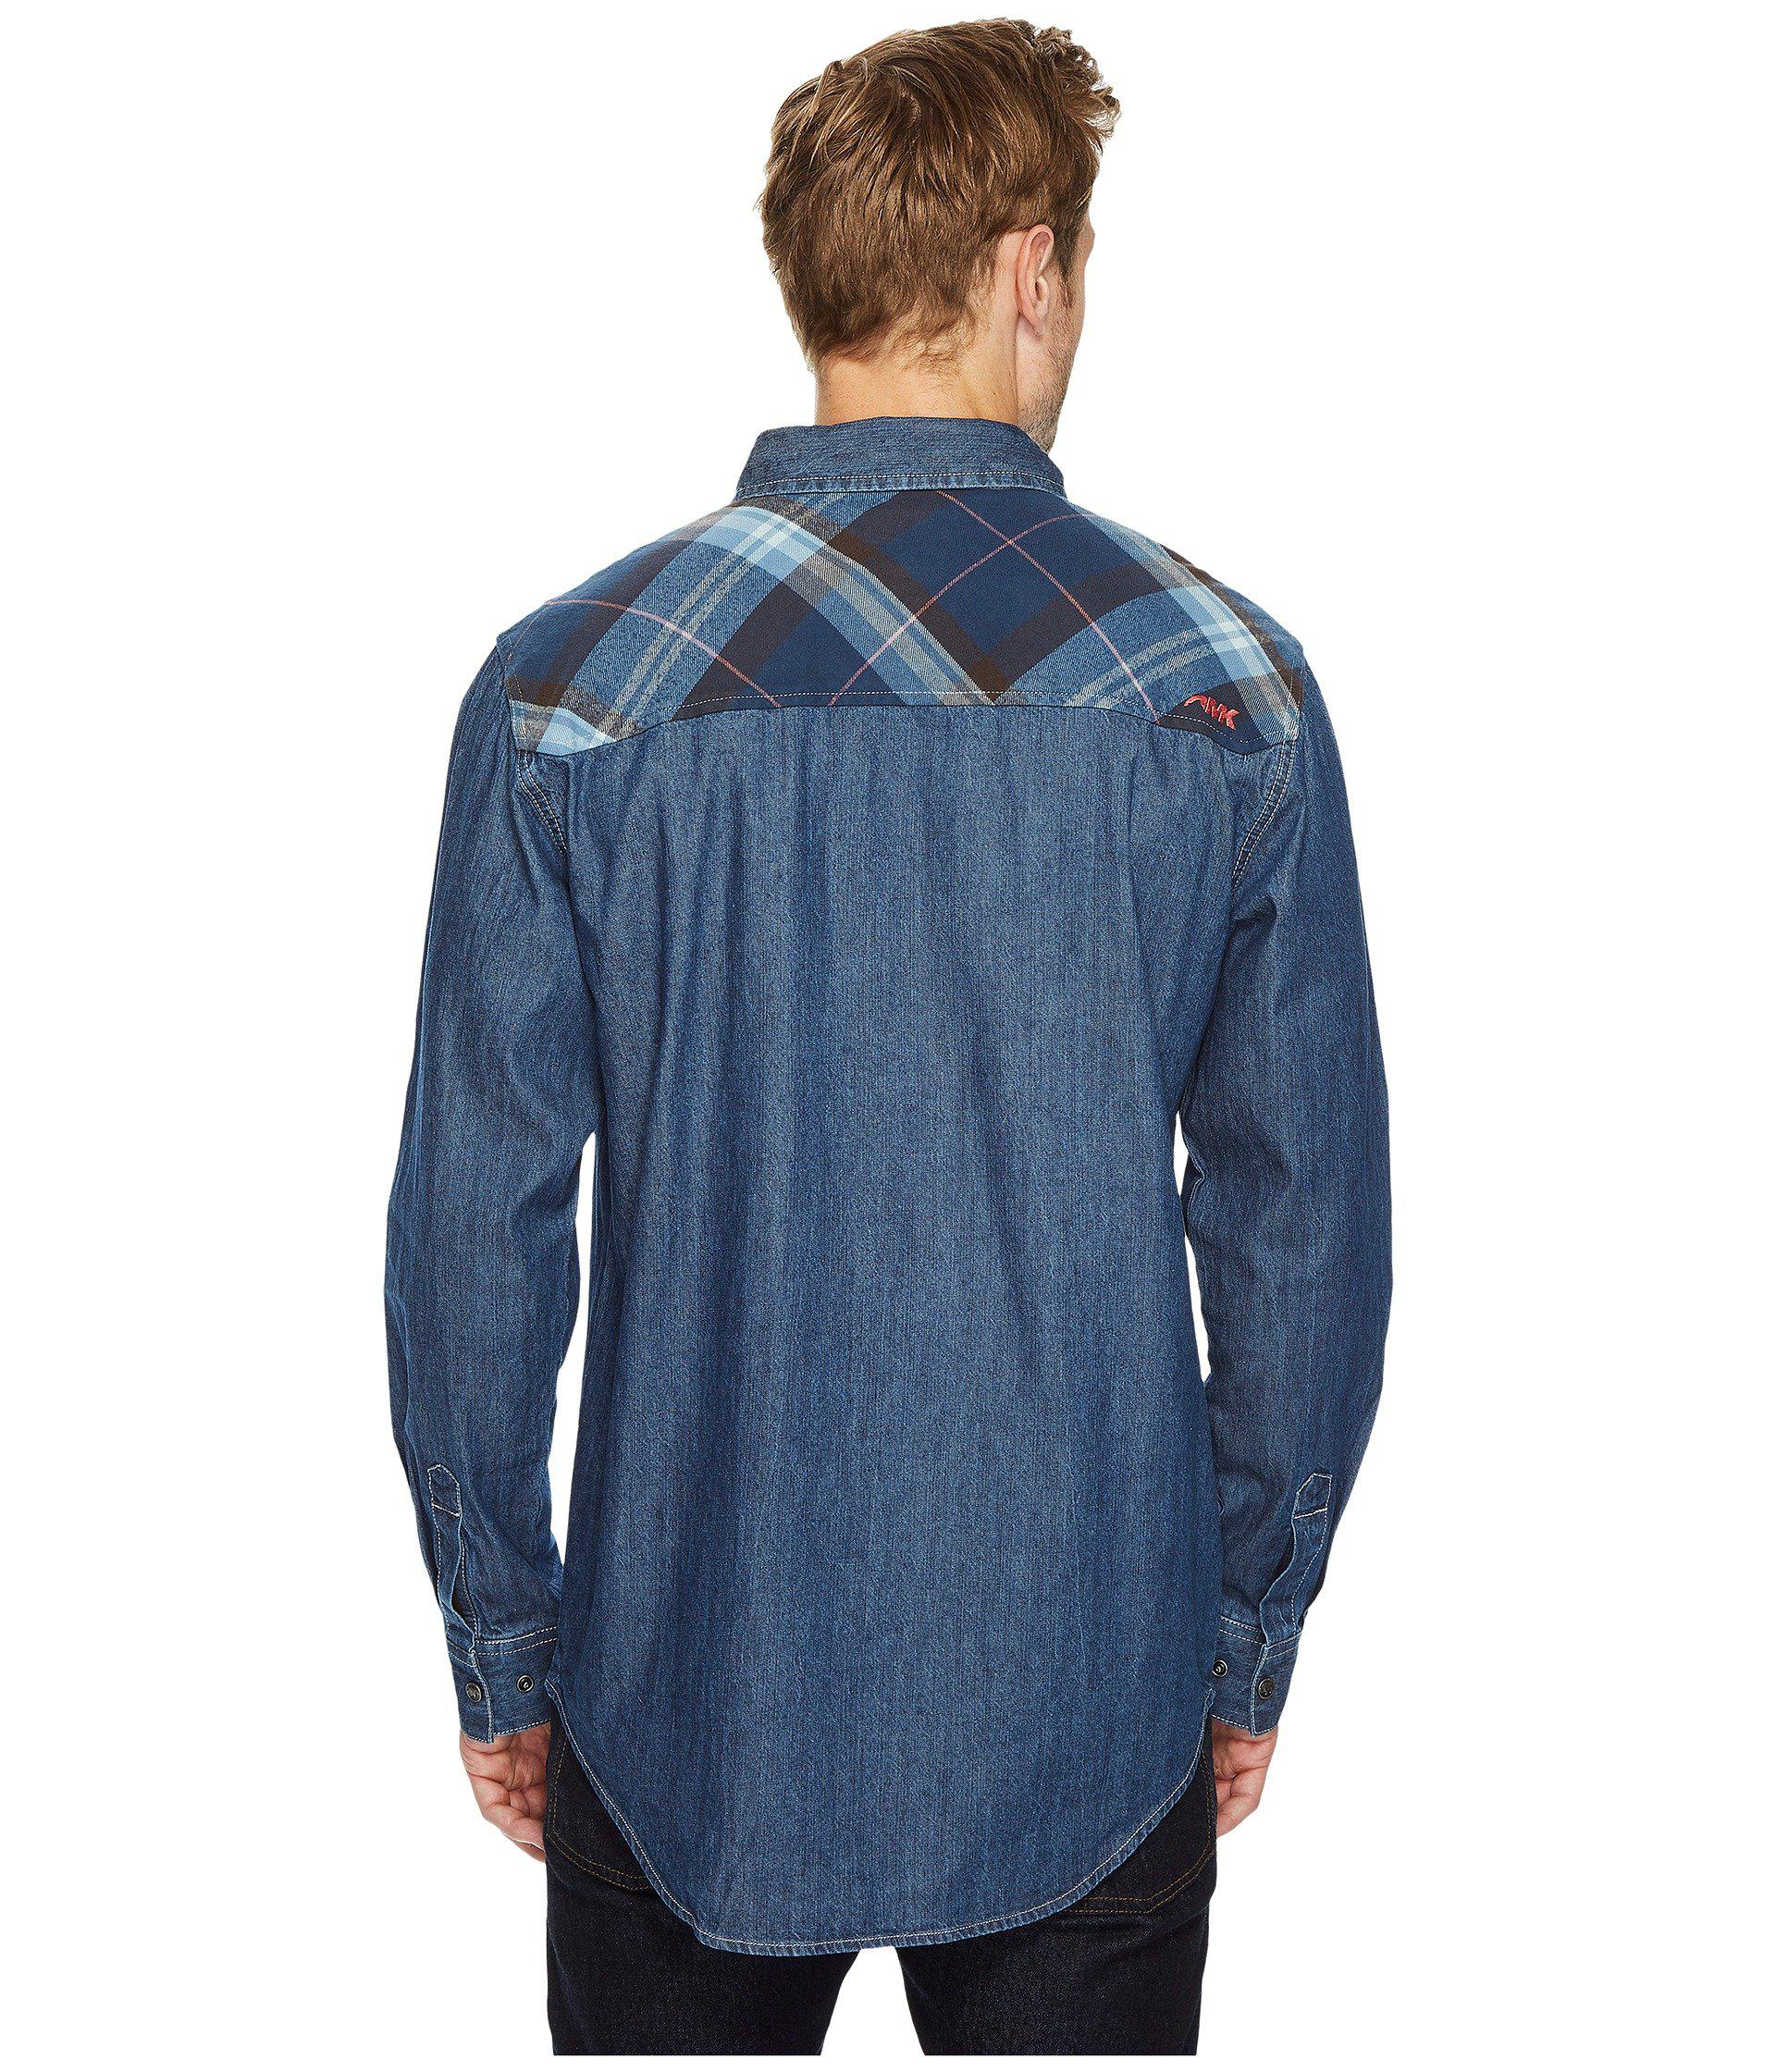 2133c10f132 Lyst - Mountain Khakis Original Mountain Denim Shirt in Blue for Men